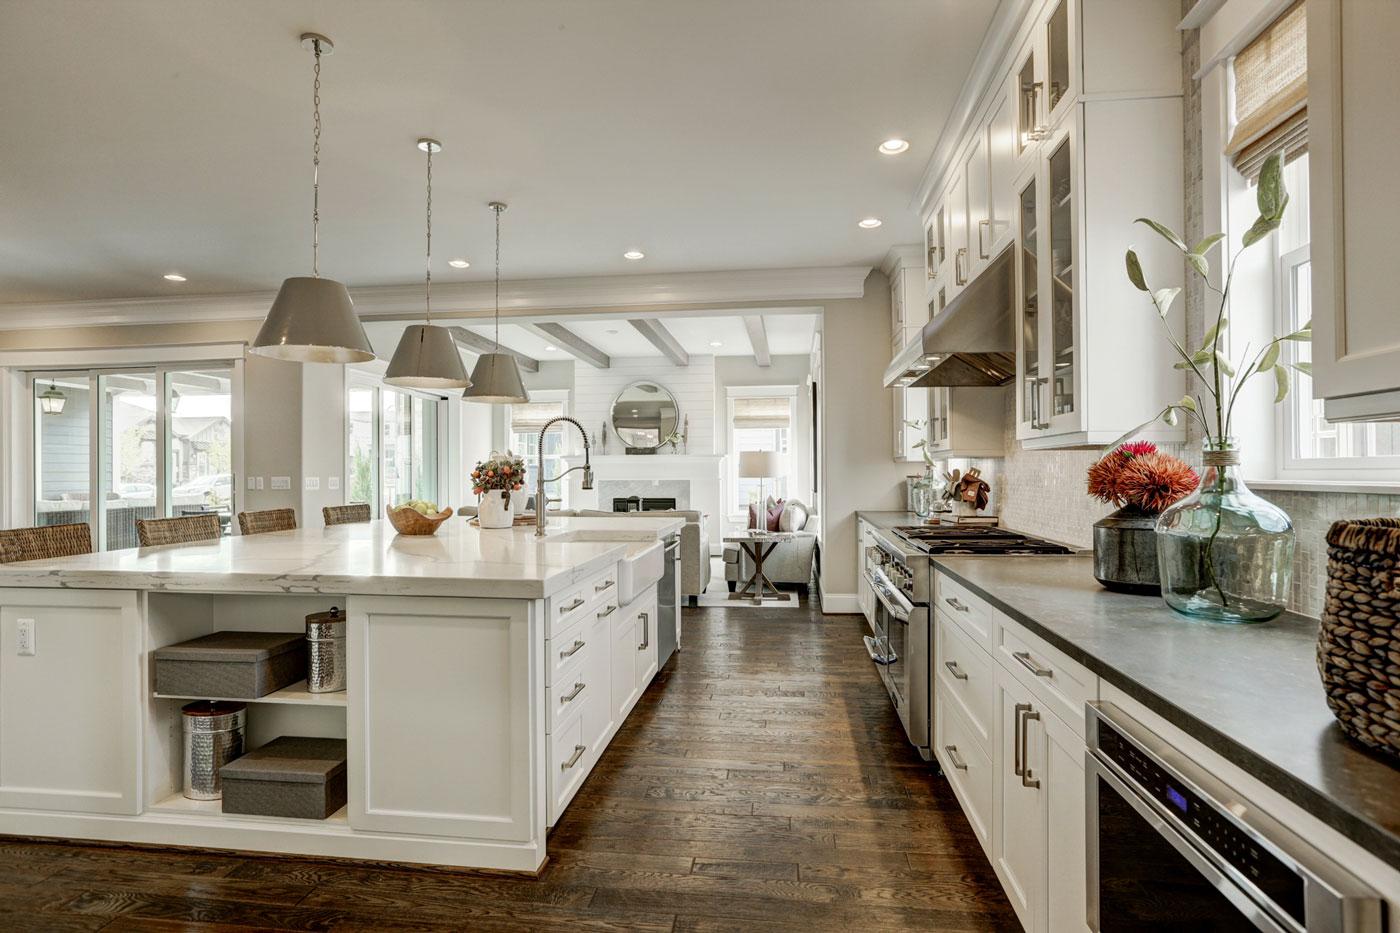 Hot Design Trends in 2019 | Lita Dirks & Co. | Award ... on Model Kitchen Images  id=57485